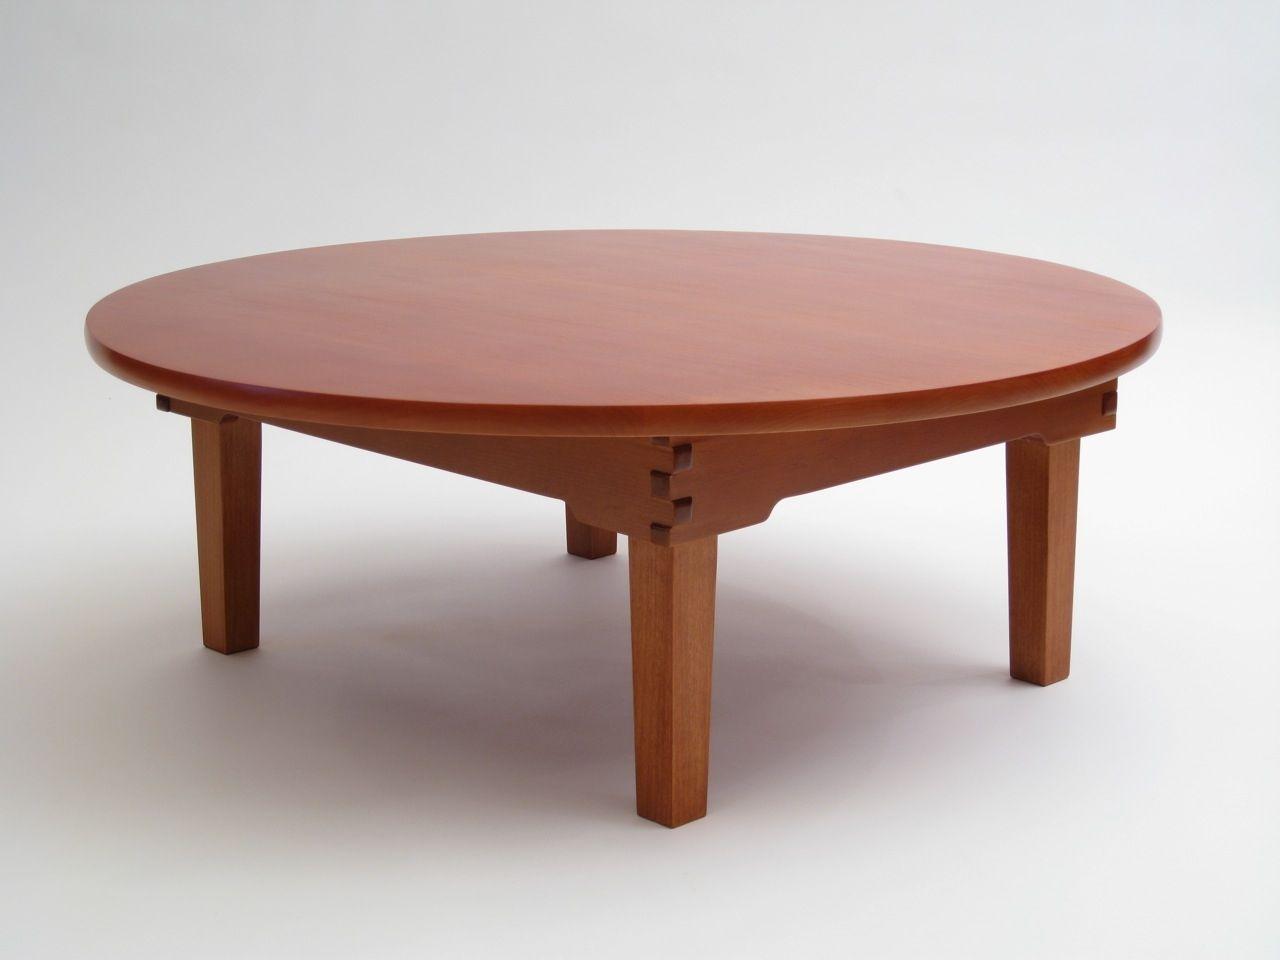 Japanese Chabudai A Low Folding Table Coffee Table Japanese Dining Table Folding Coffee Table